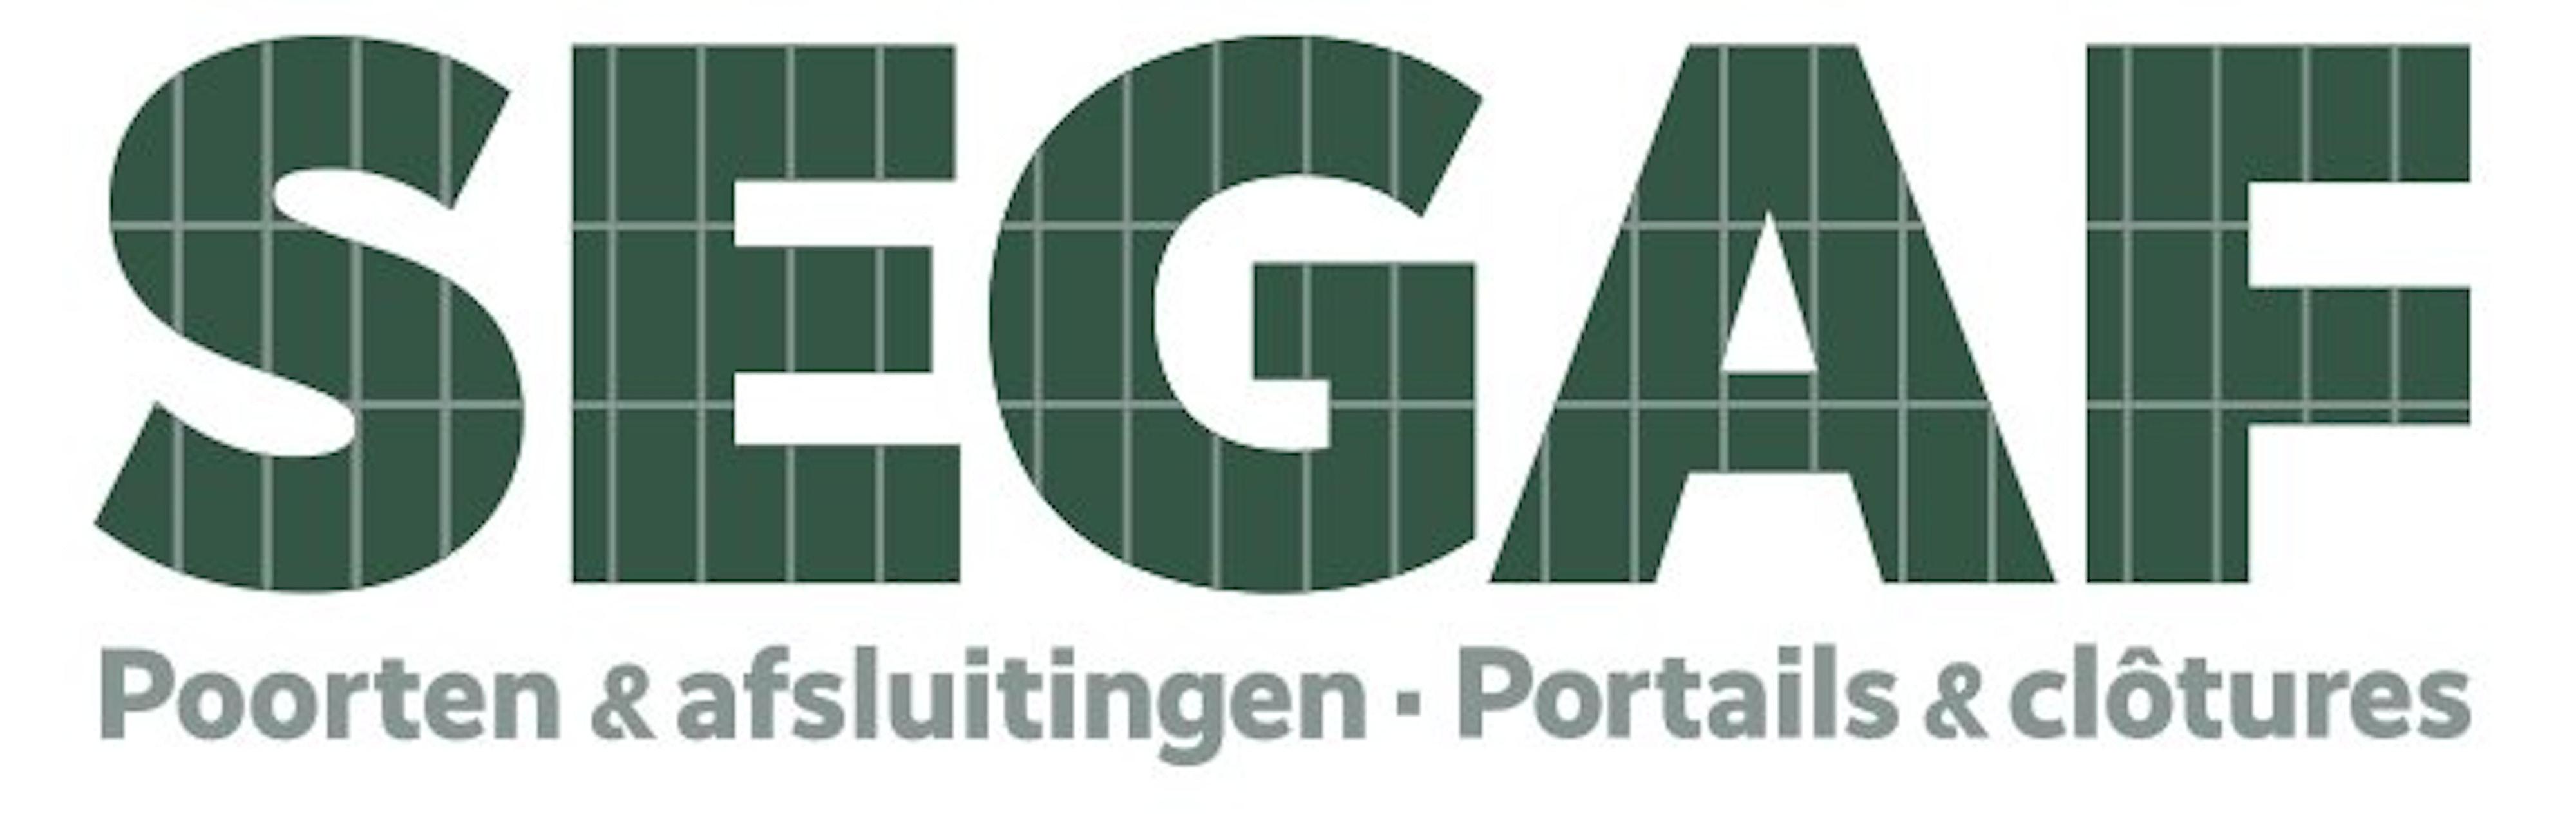 Segaf logo